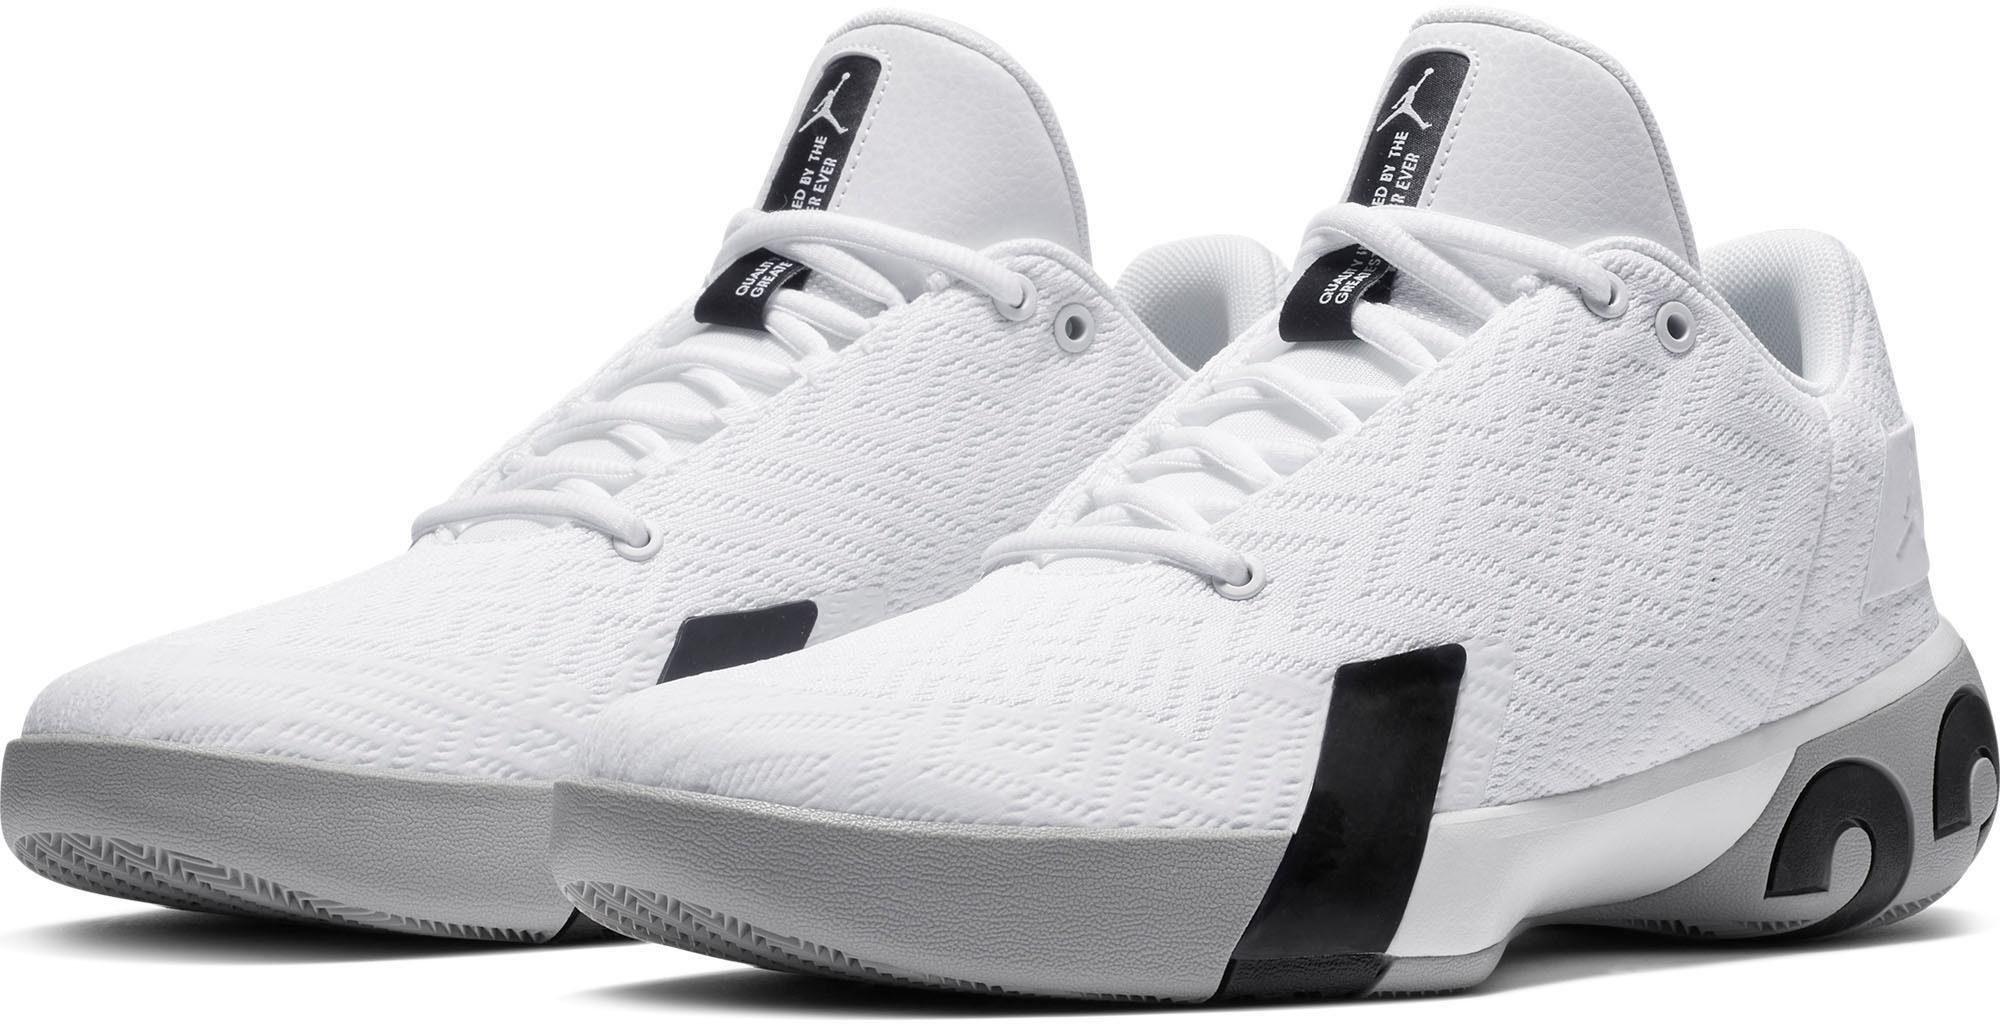 Jordan »Jordan Ultra Fly 3« Basketballschuh kaufen | OTTO